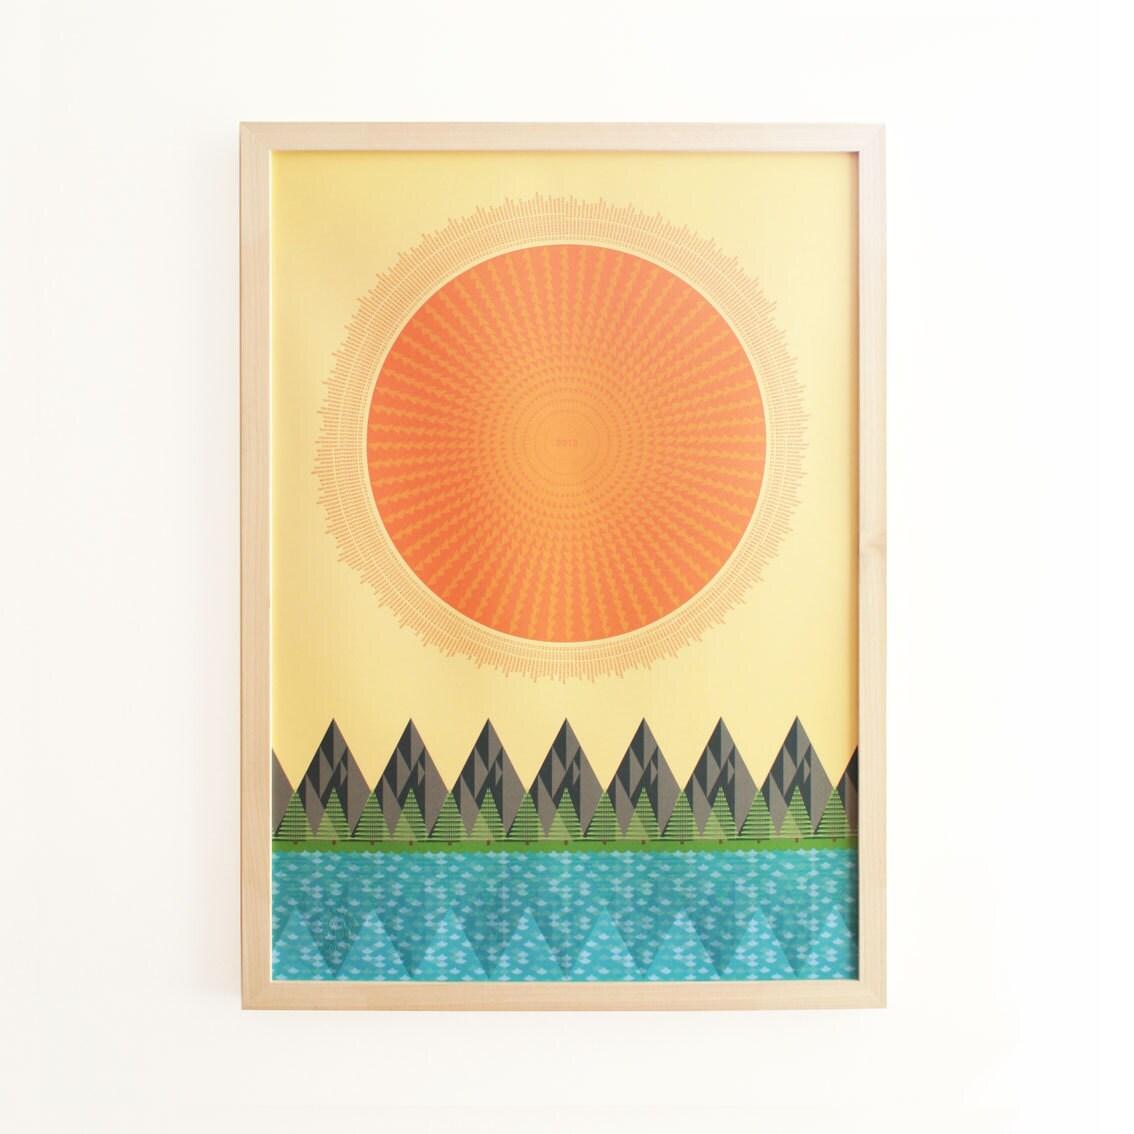 2013 The Sun, It Shines Typographic Calendar Poster